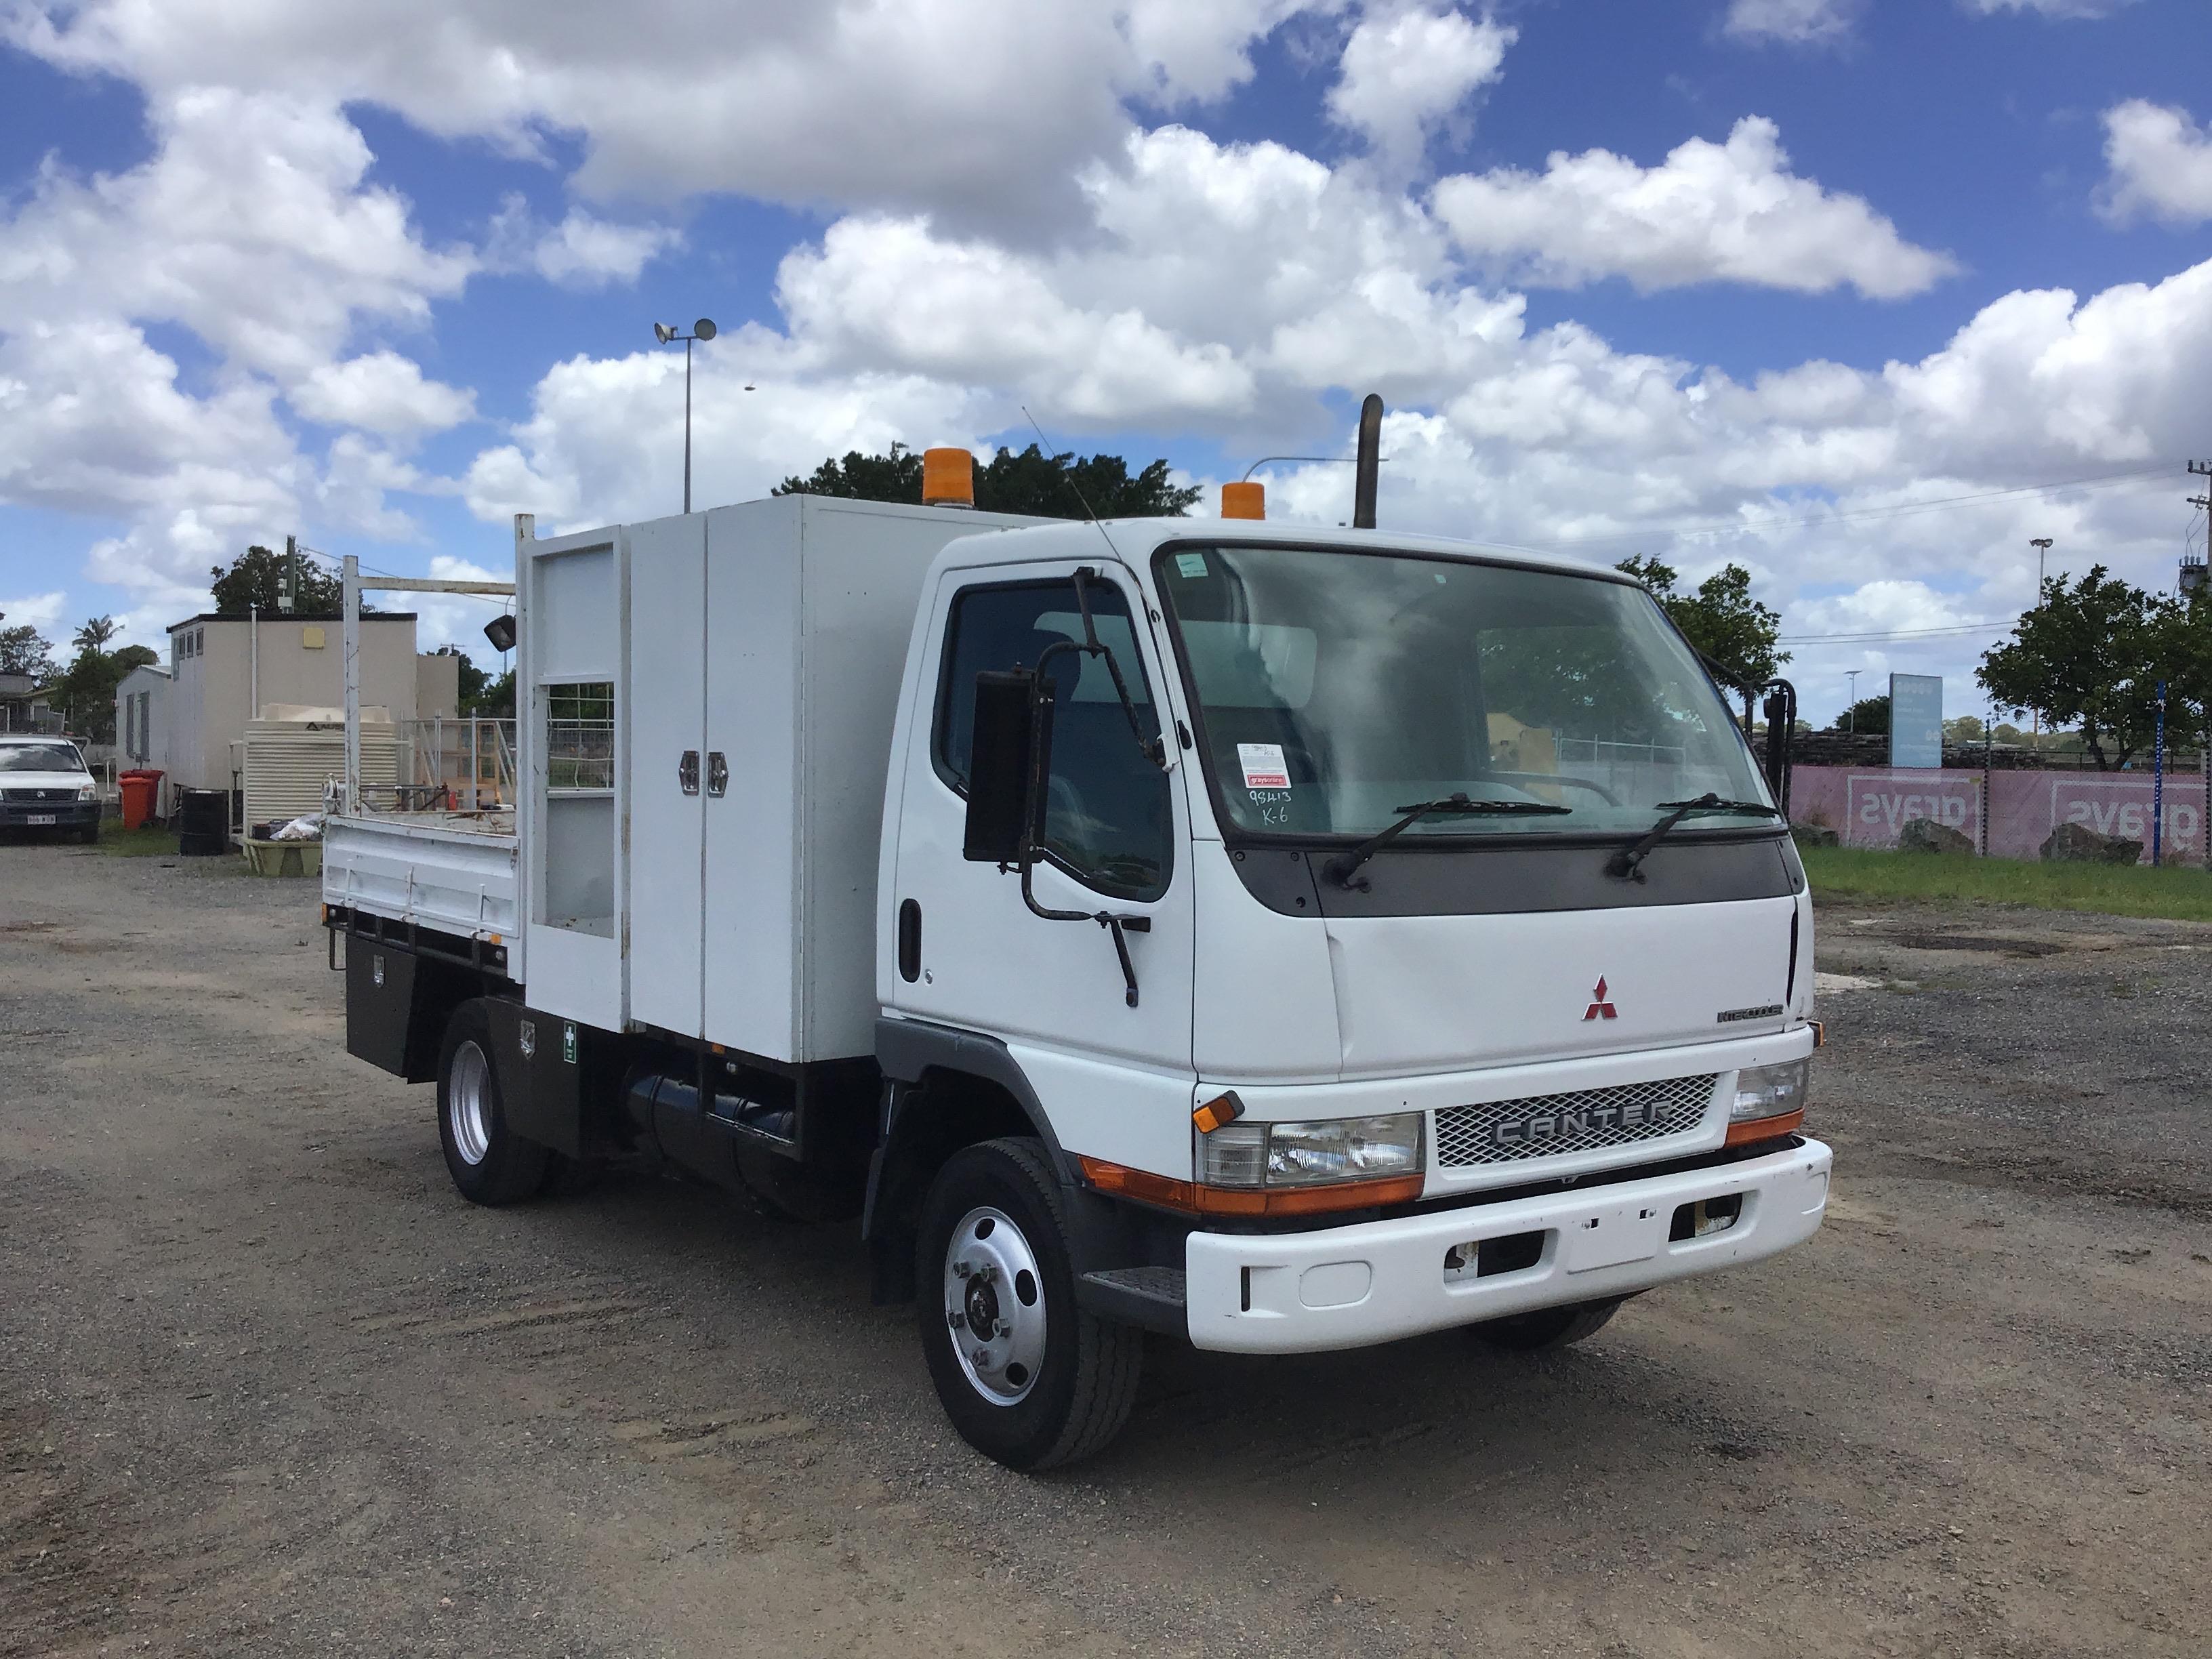 2003 Mitsubishi Canter 4 x 2 Tipper Truck